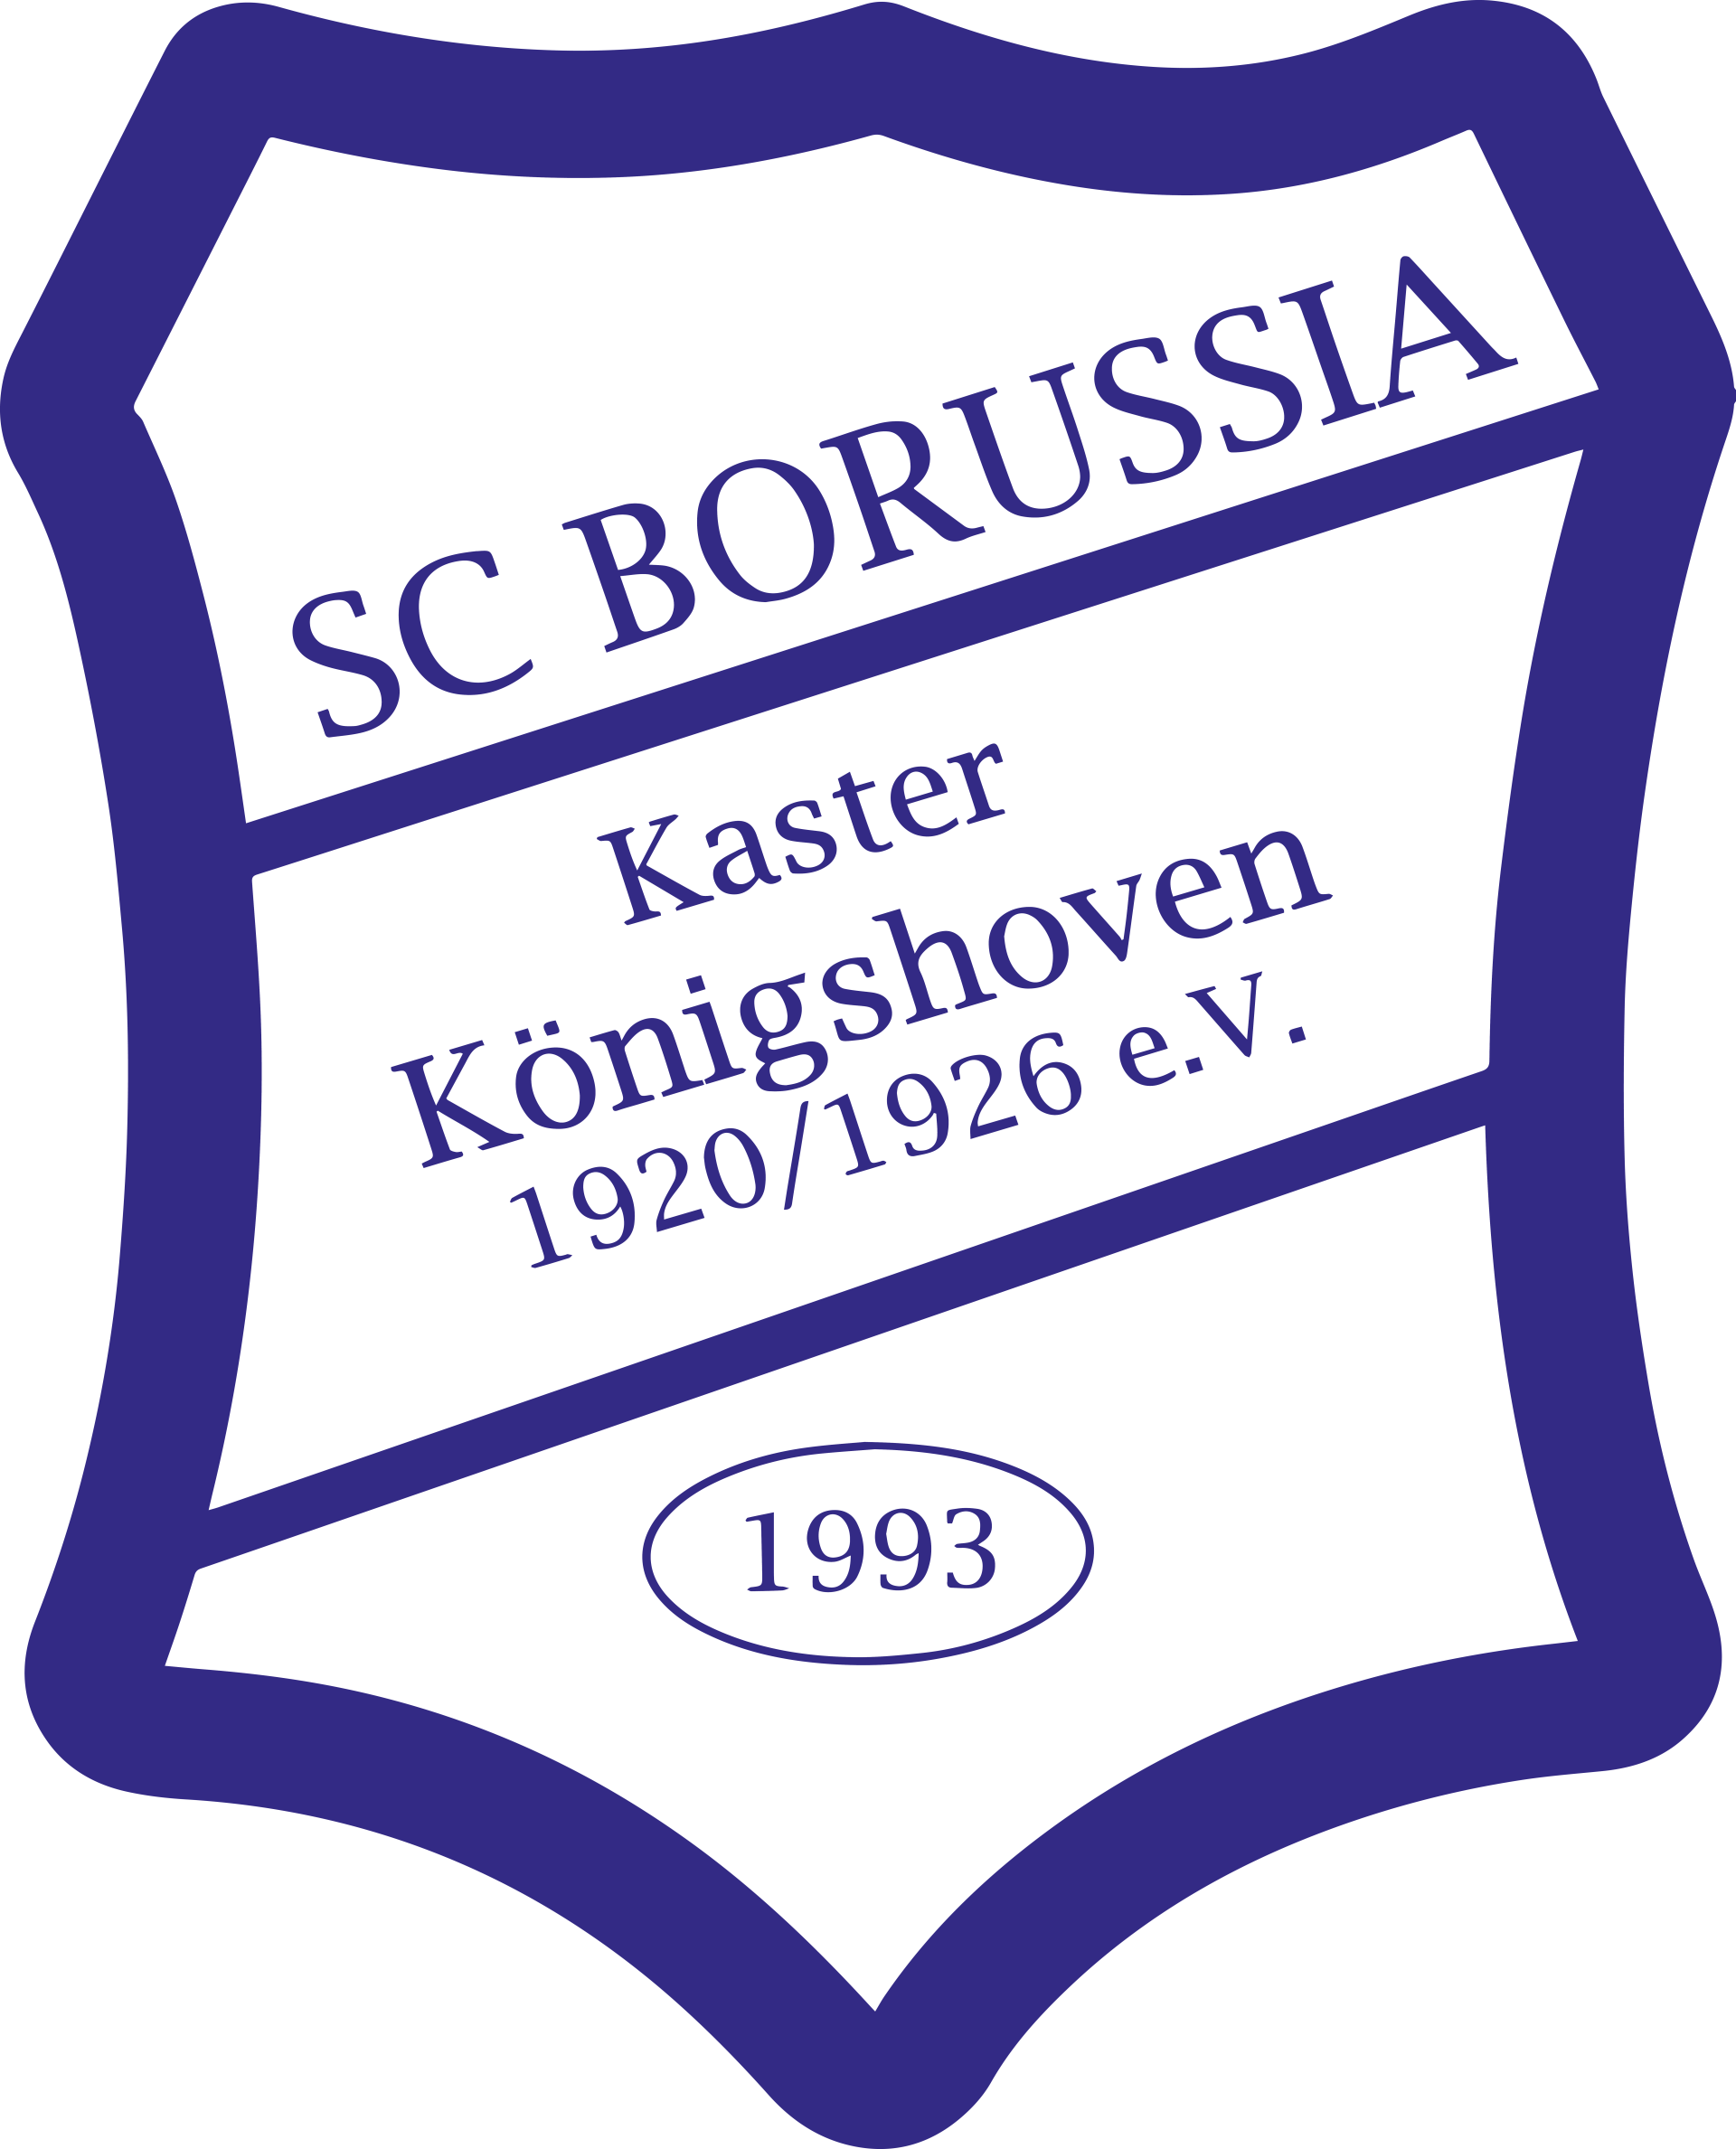 Borussia Kaster Königshoven